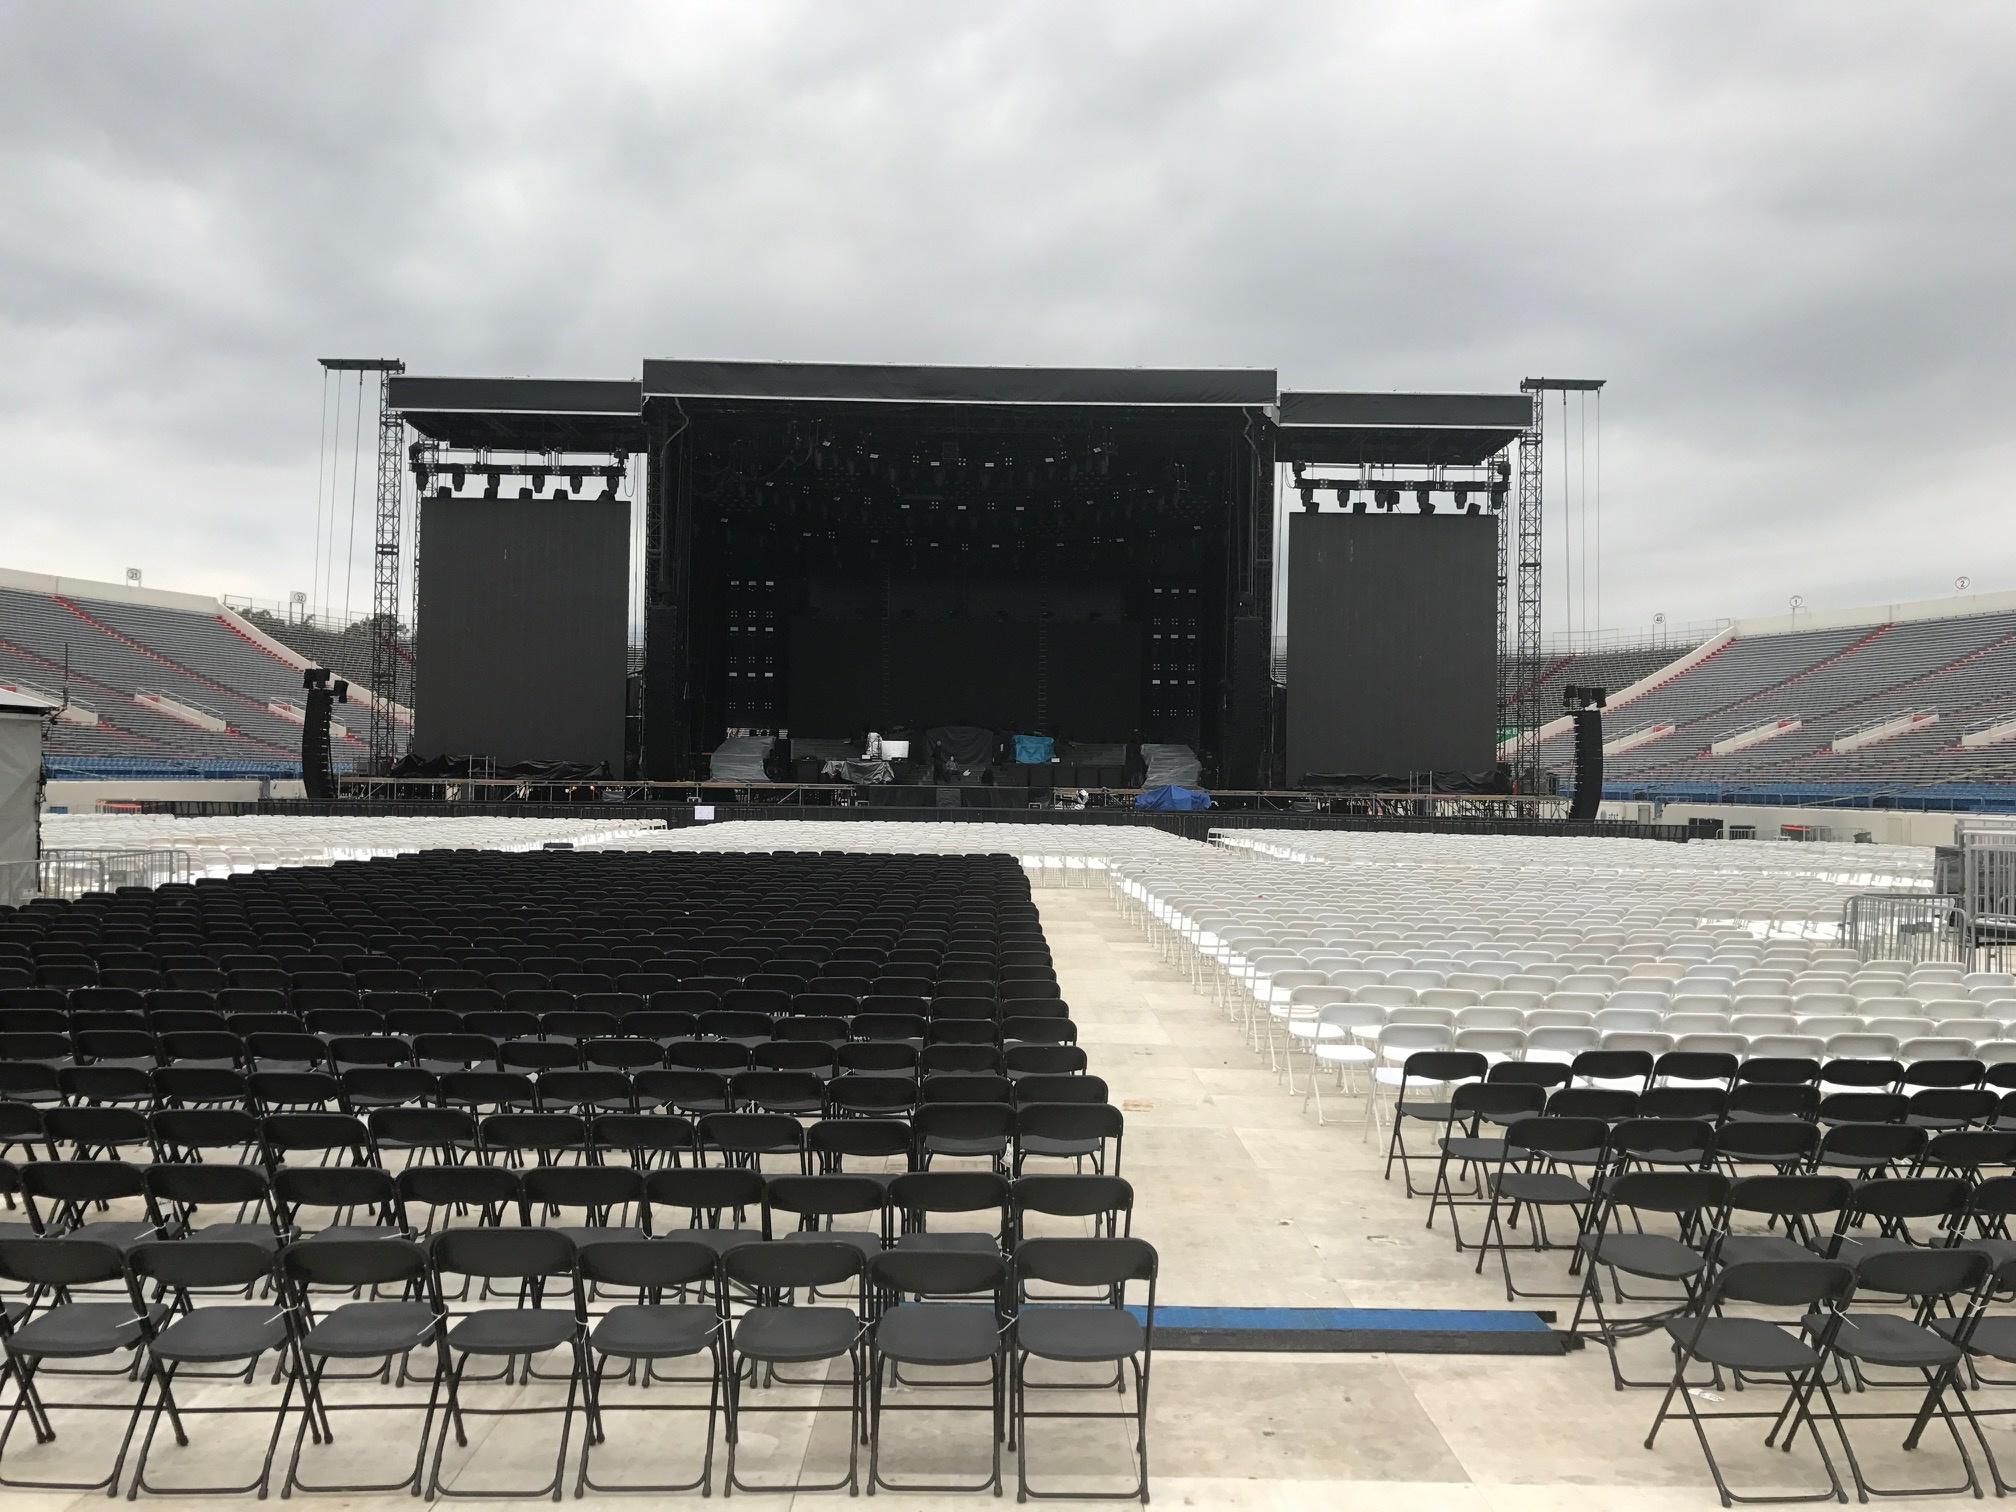 Event Venue Before Concert